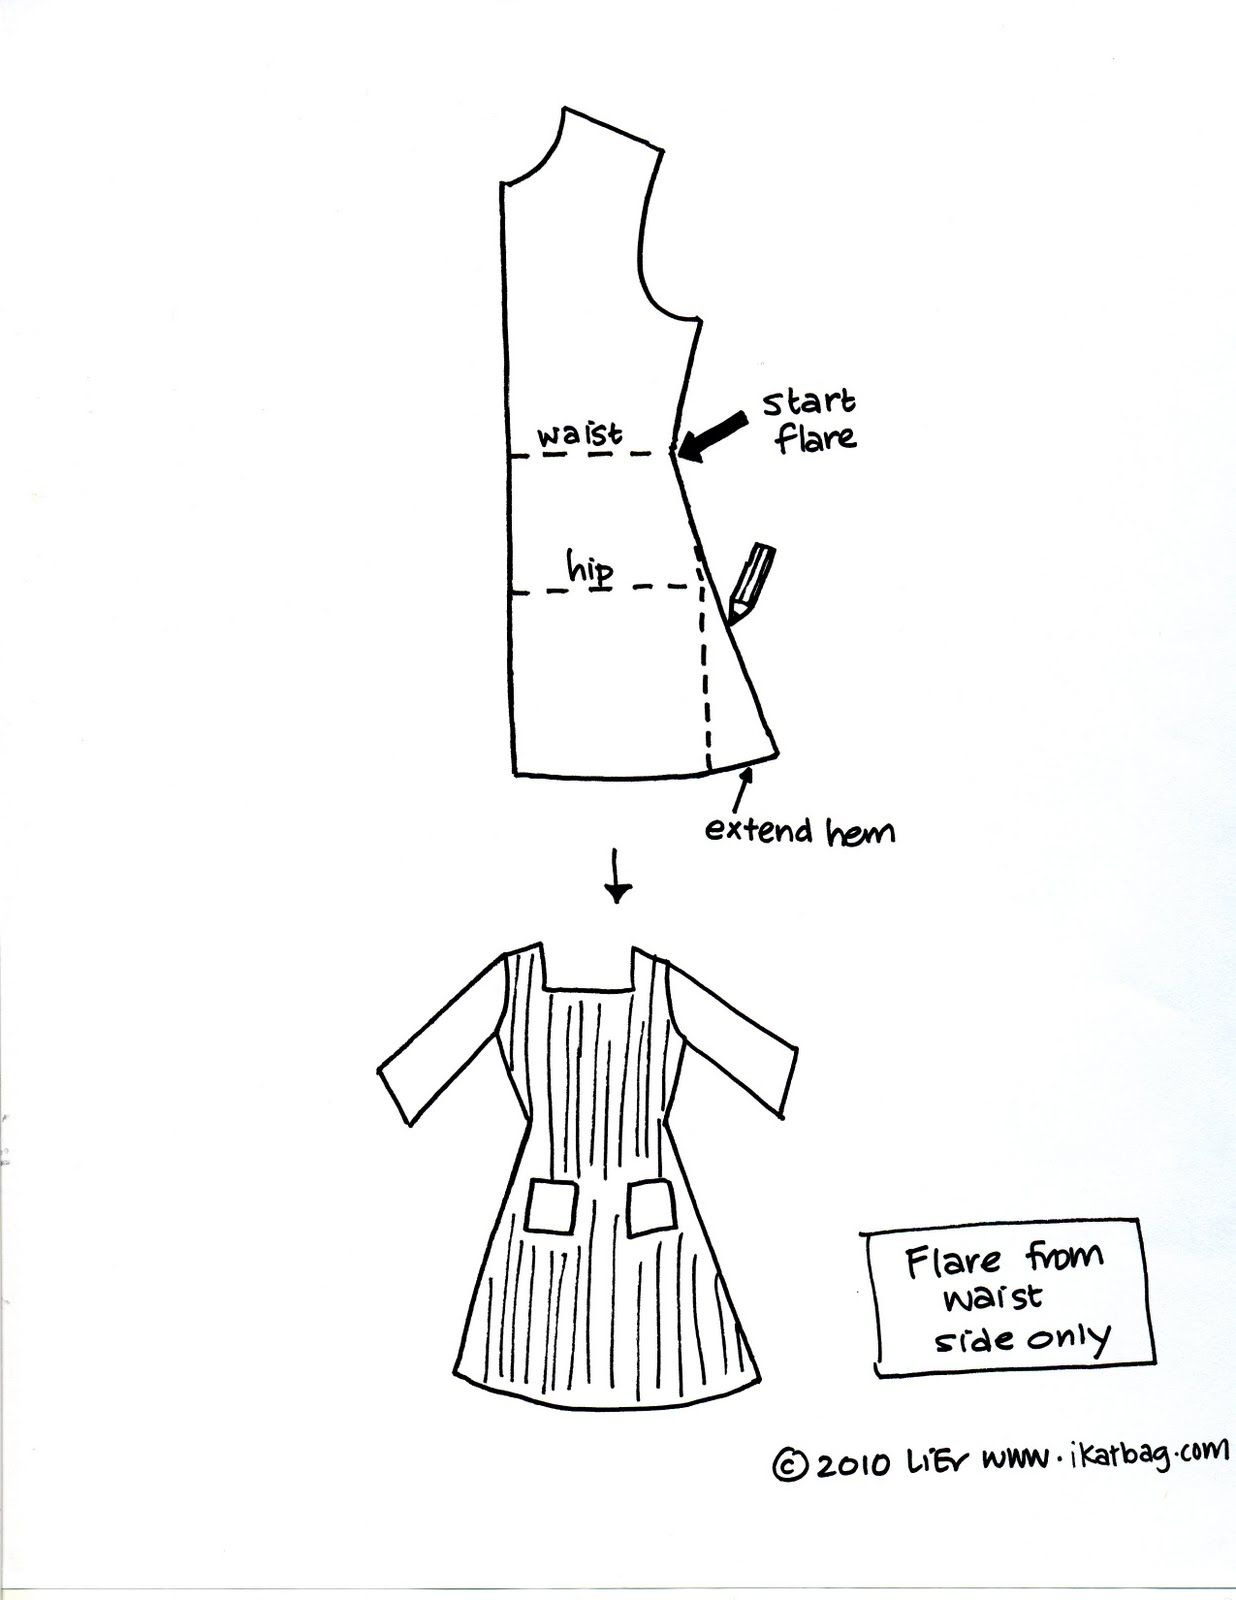 Ikat Bag Drafting Part Ix The Bottom Half